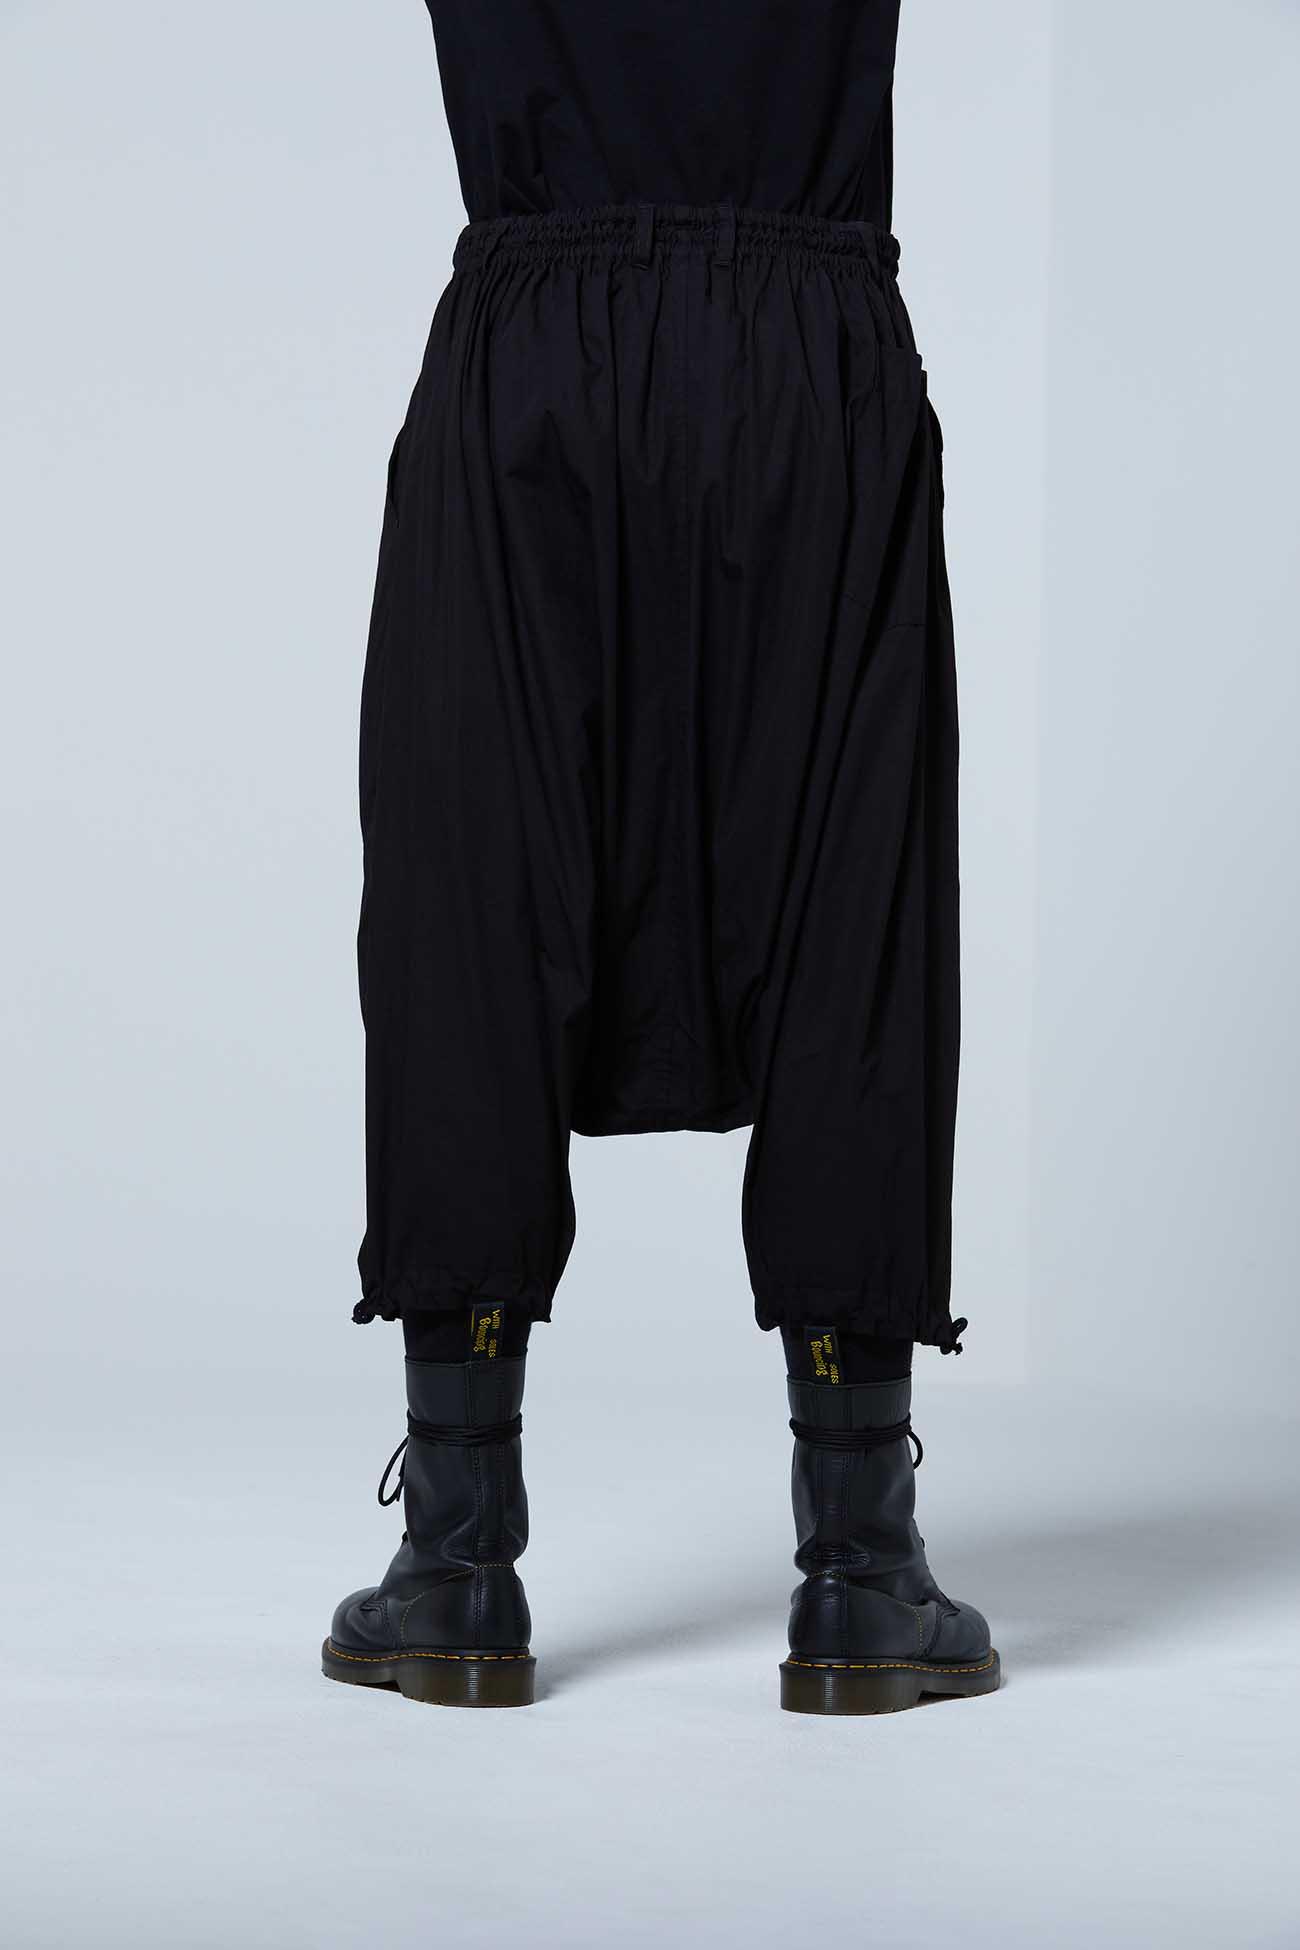 40/2 Cotton Broad Drawstring Sarrouel Pants